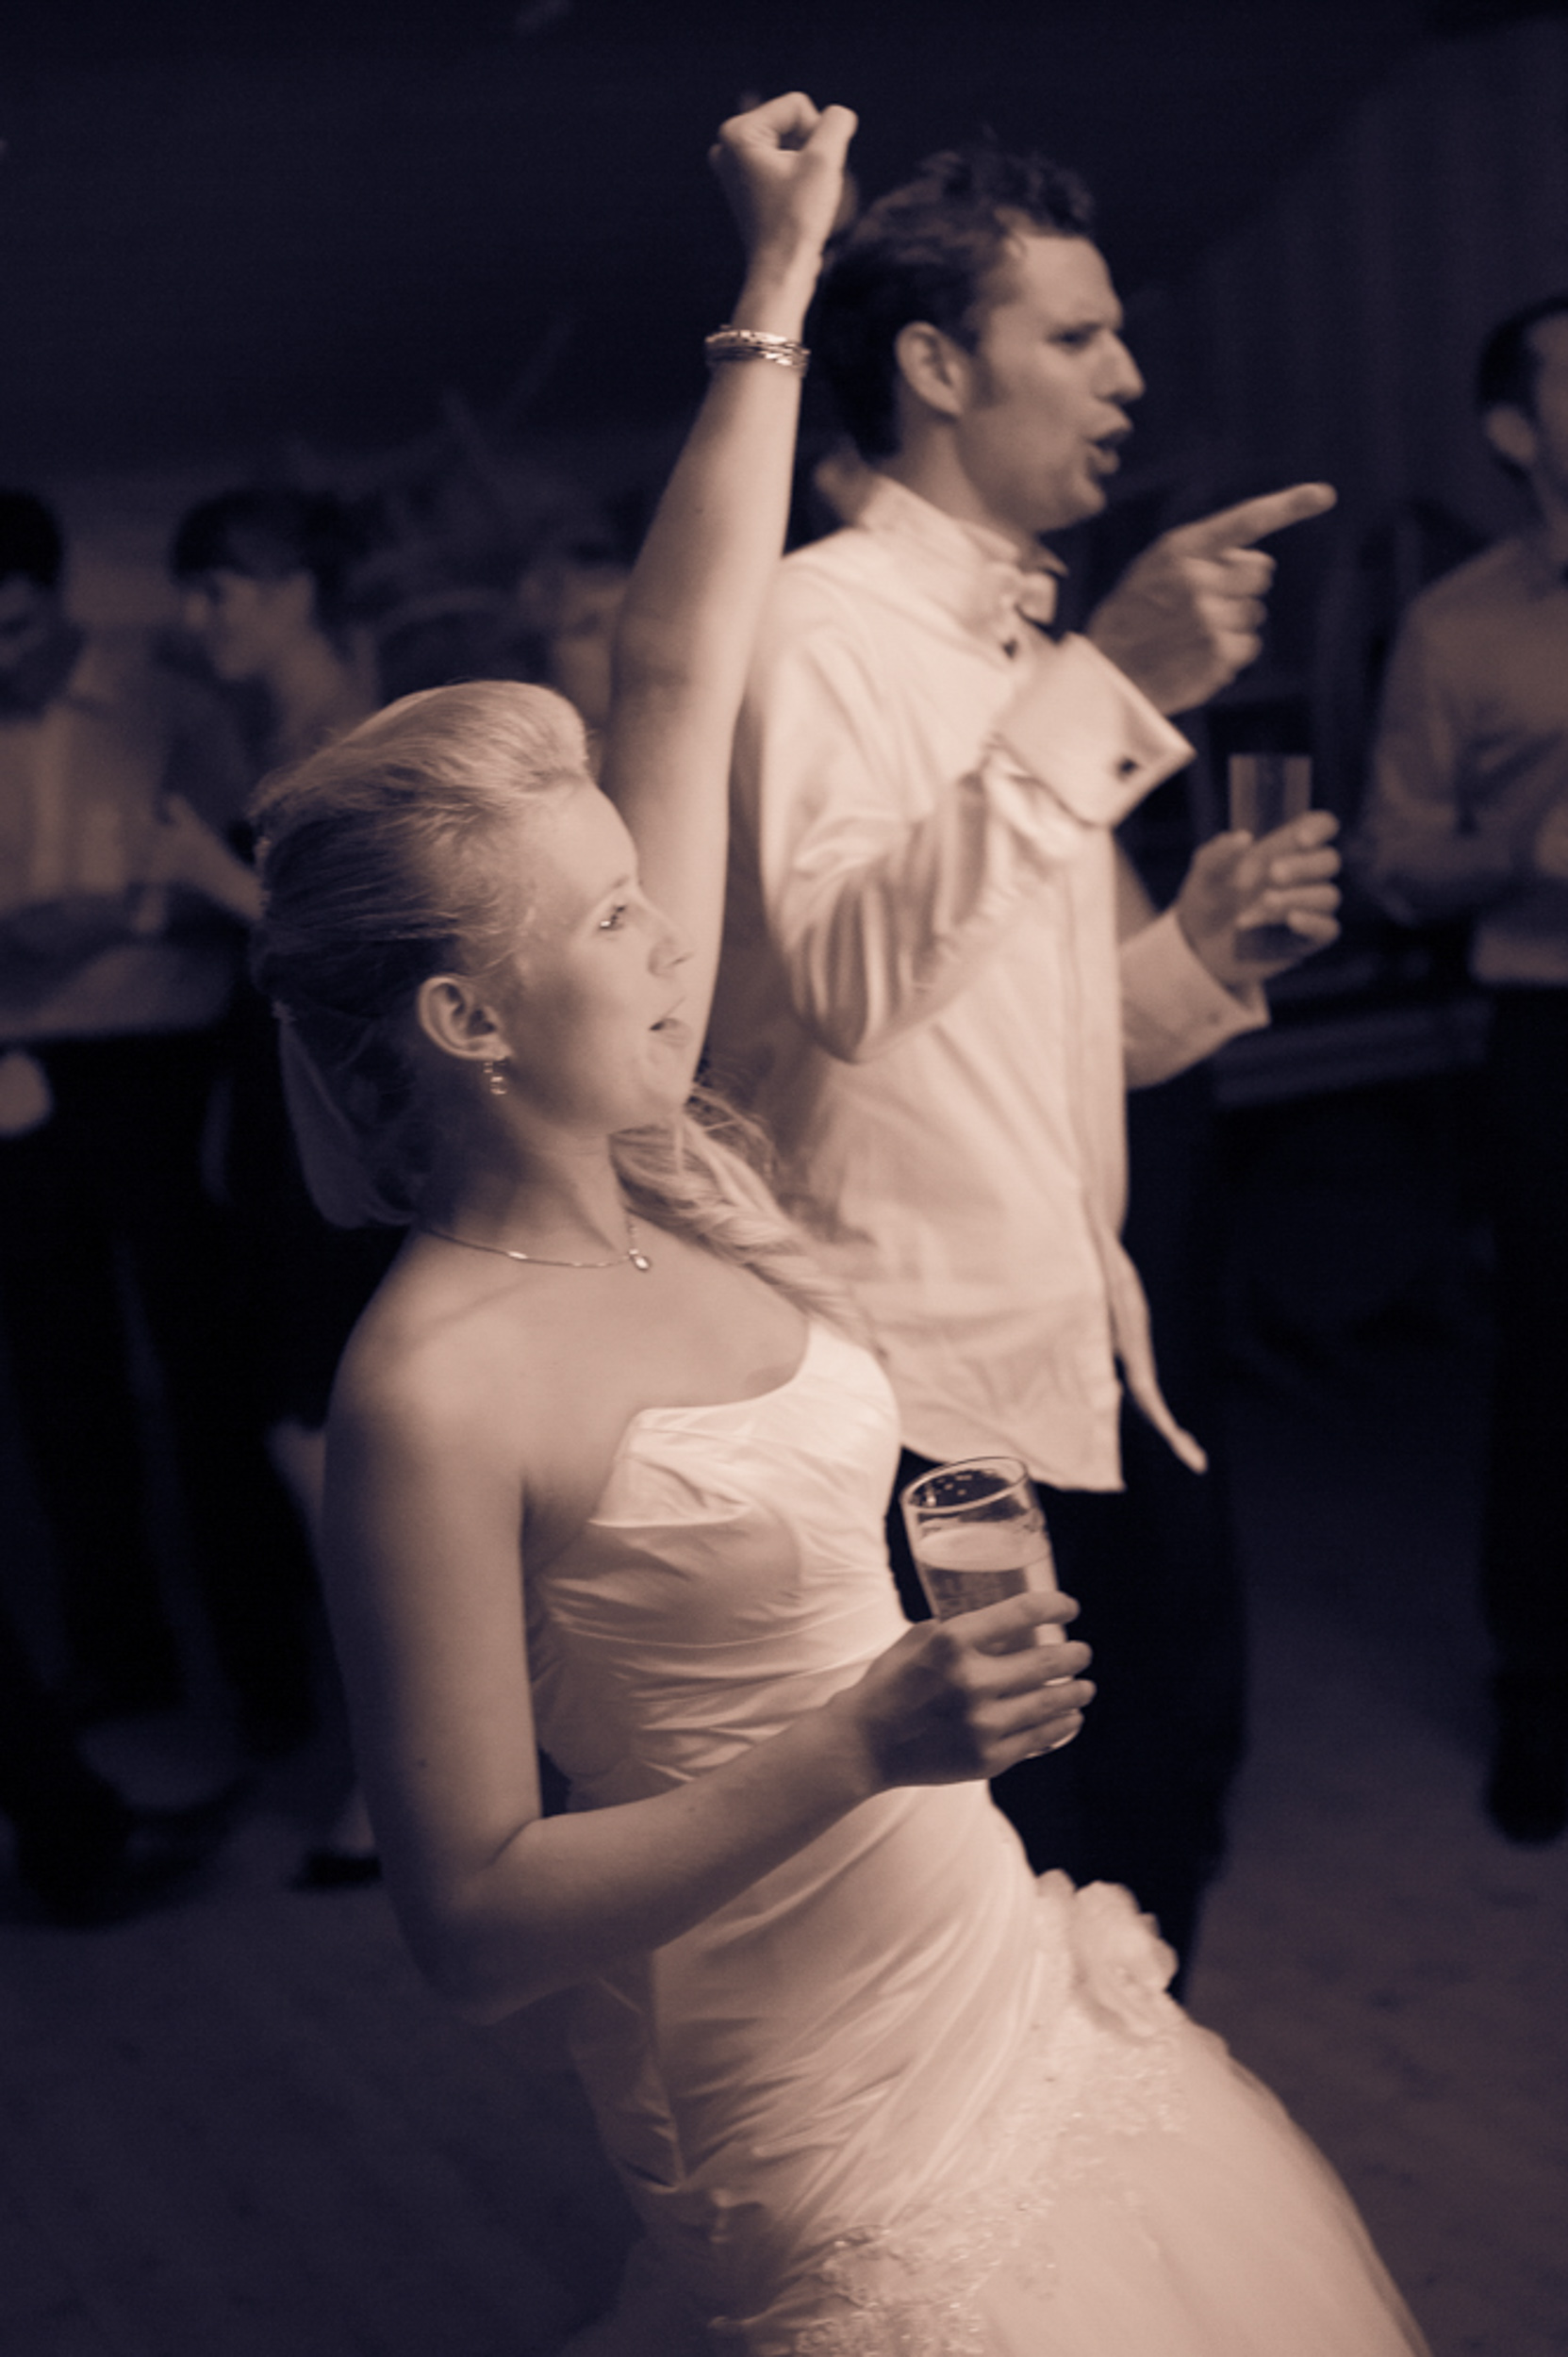 Hochzeit_Carla-188-2.jpg